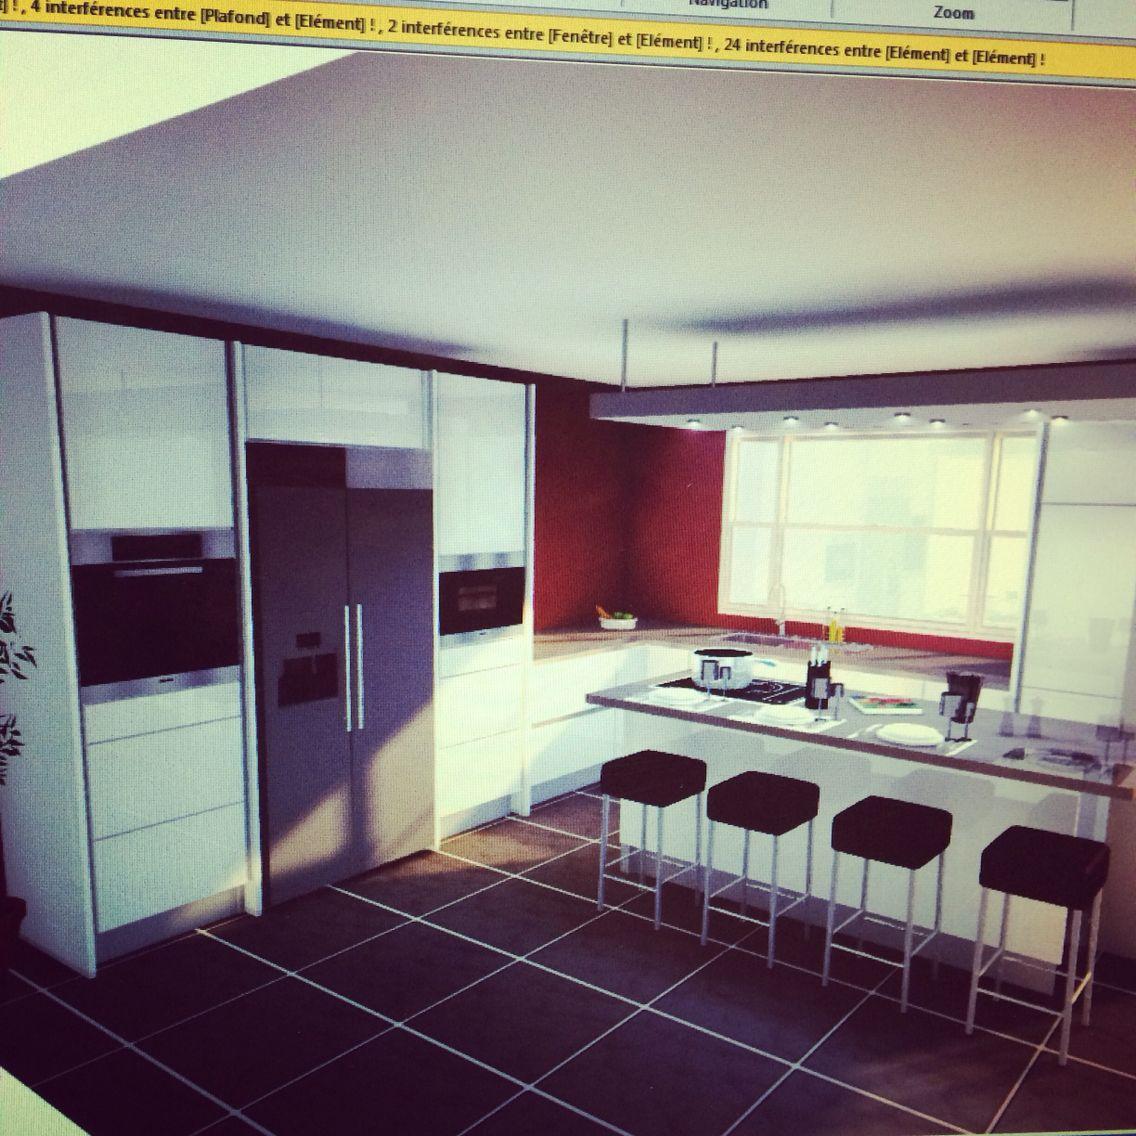 cuisine blanc premium ultra brillant sans poign e avec frigo am ricain int gr nobilia lignea. Black Bedroom Furniture Sets. Home Design Ideas